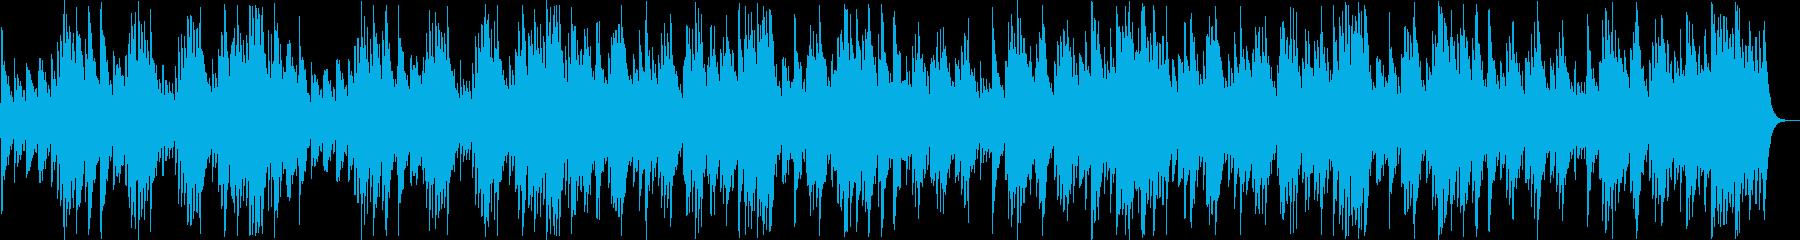 G線上のアリア/バッハ(オルゴール)の再生済みの波形